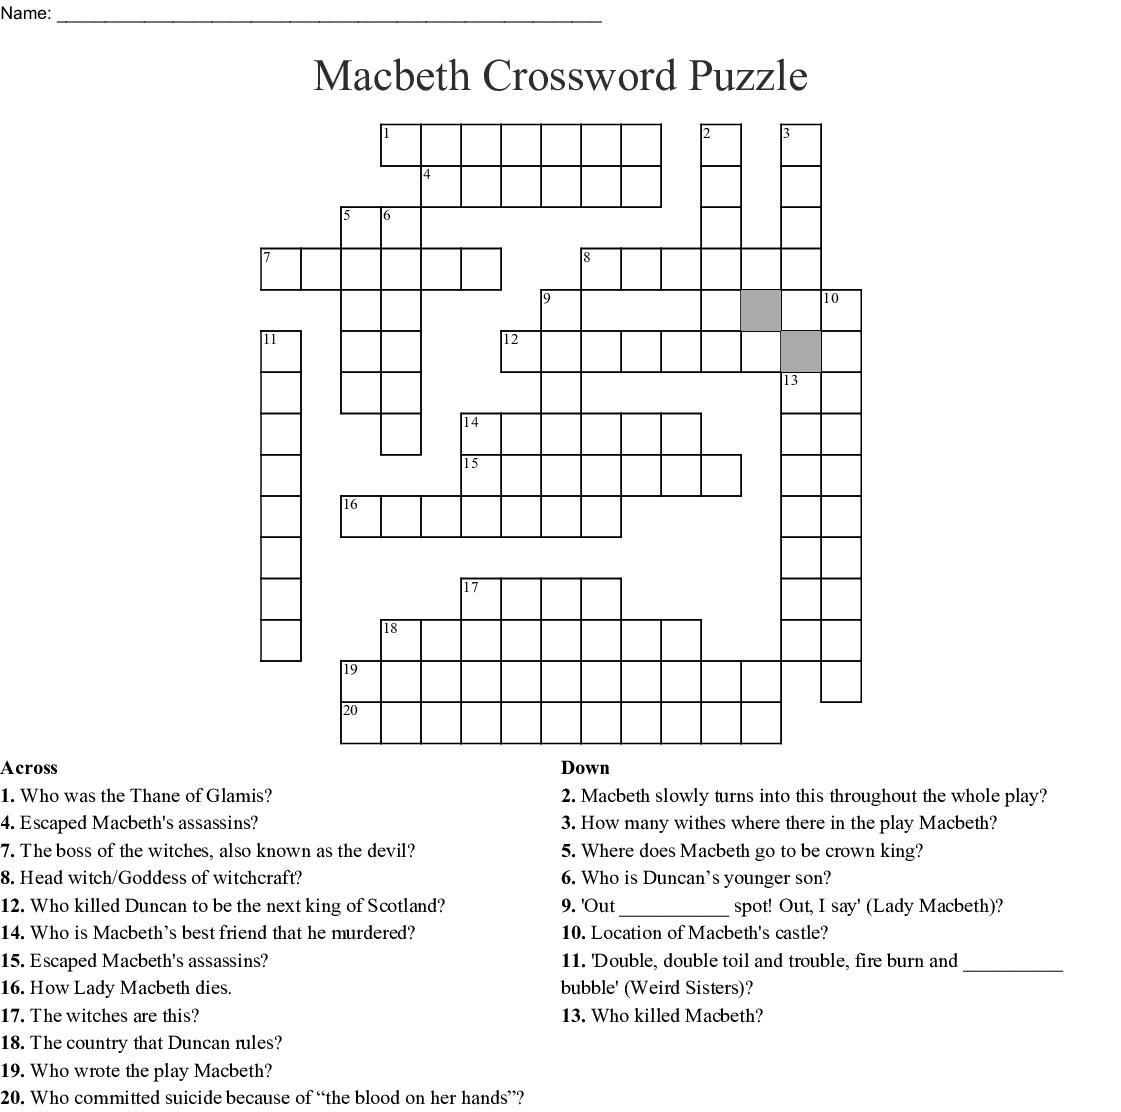 Macbeth Crossword Puzzle Crossword - Wordmint - Printable Tagalog Crossword Puzzle